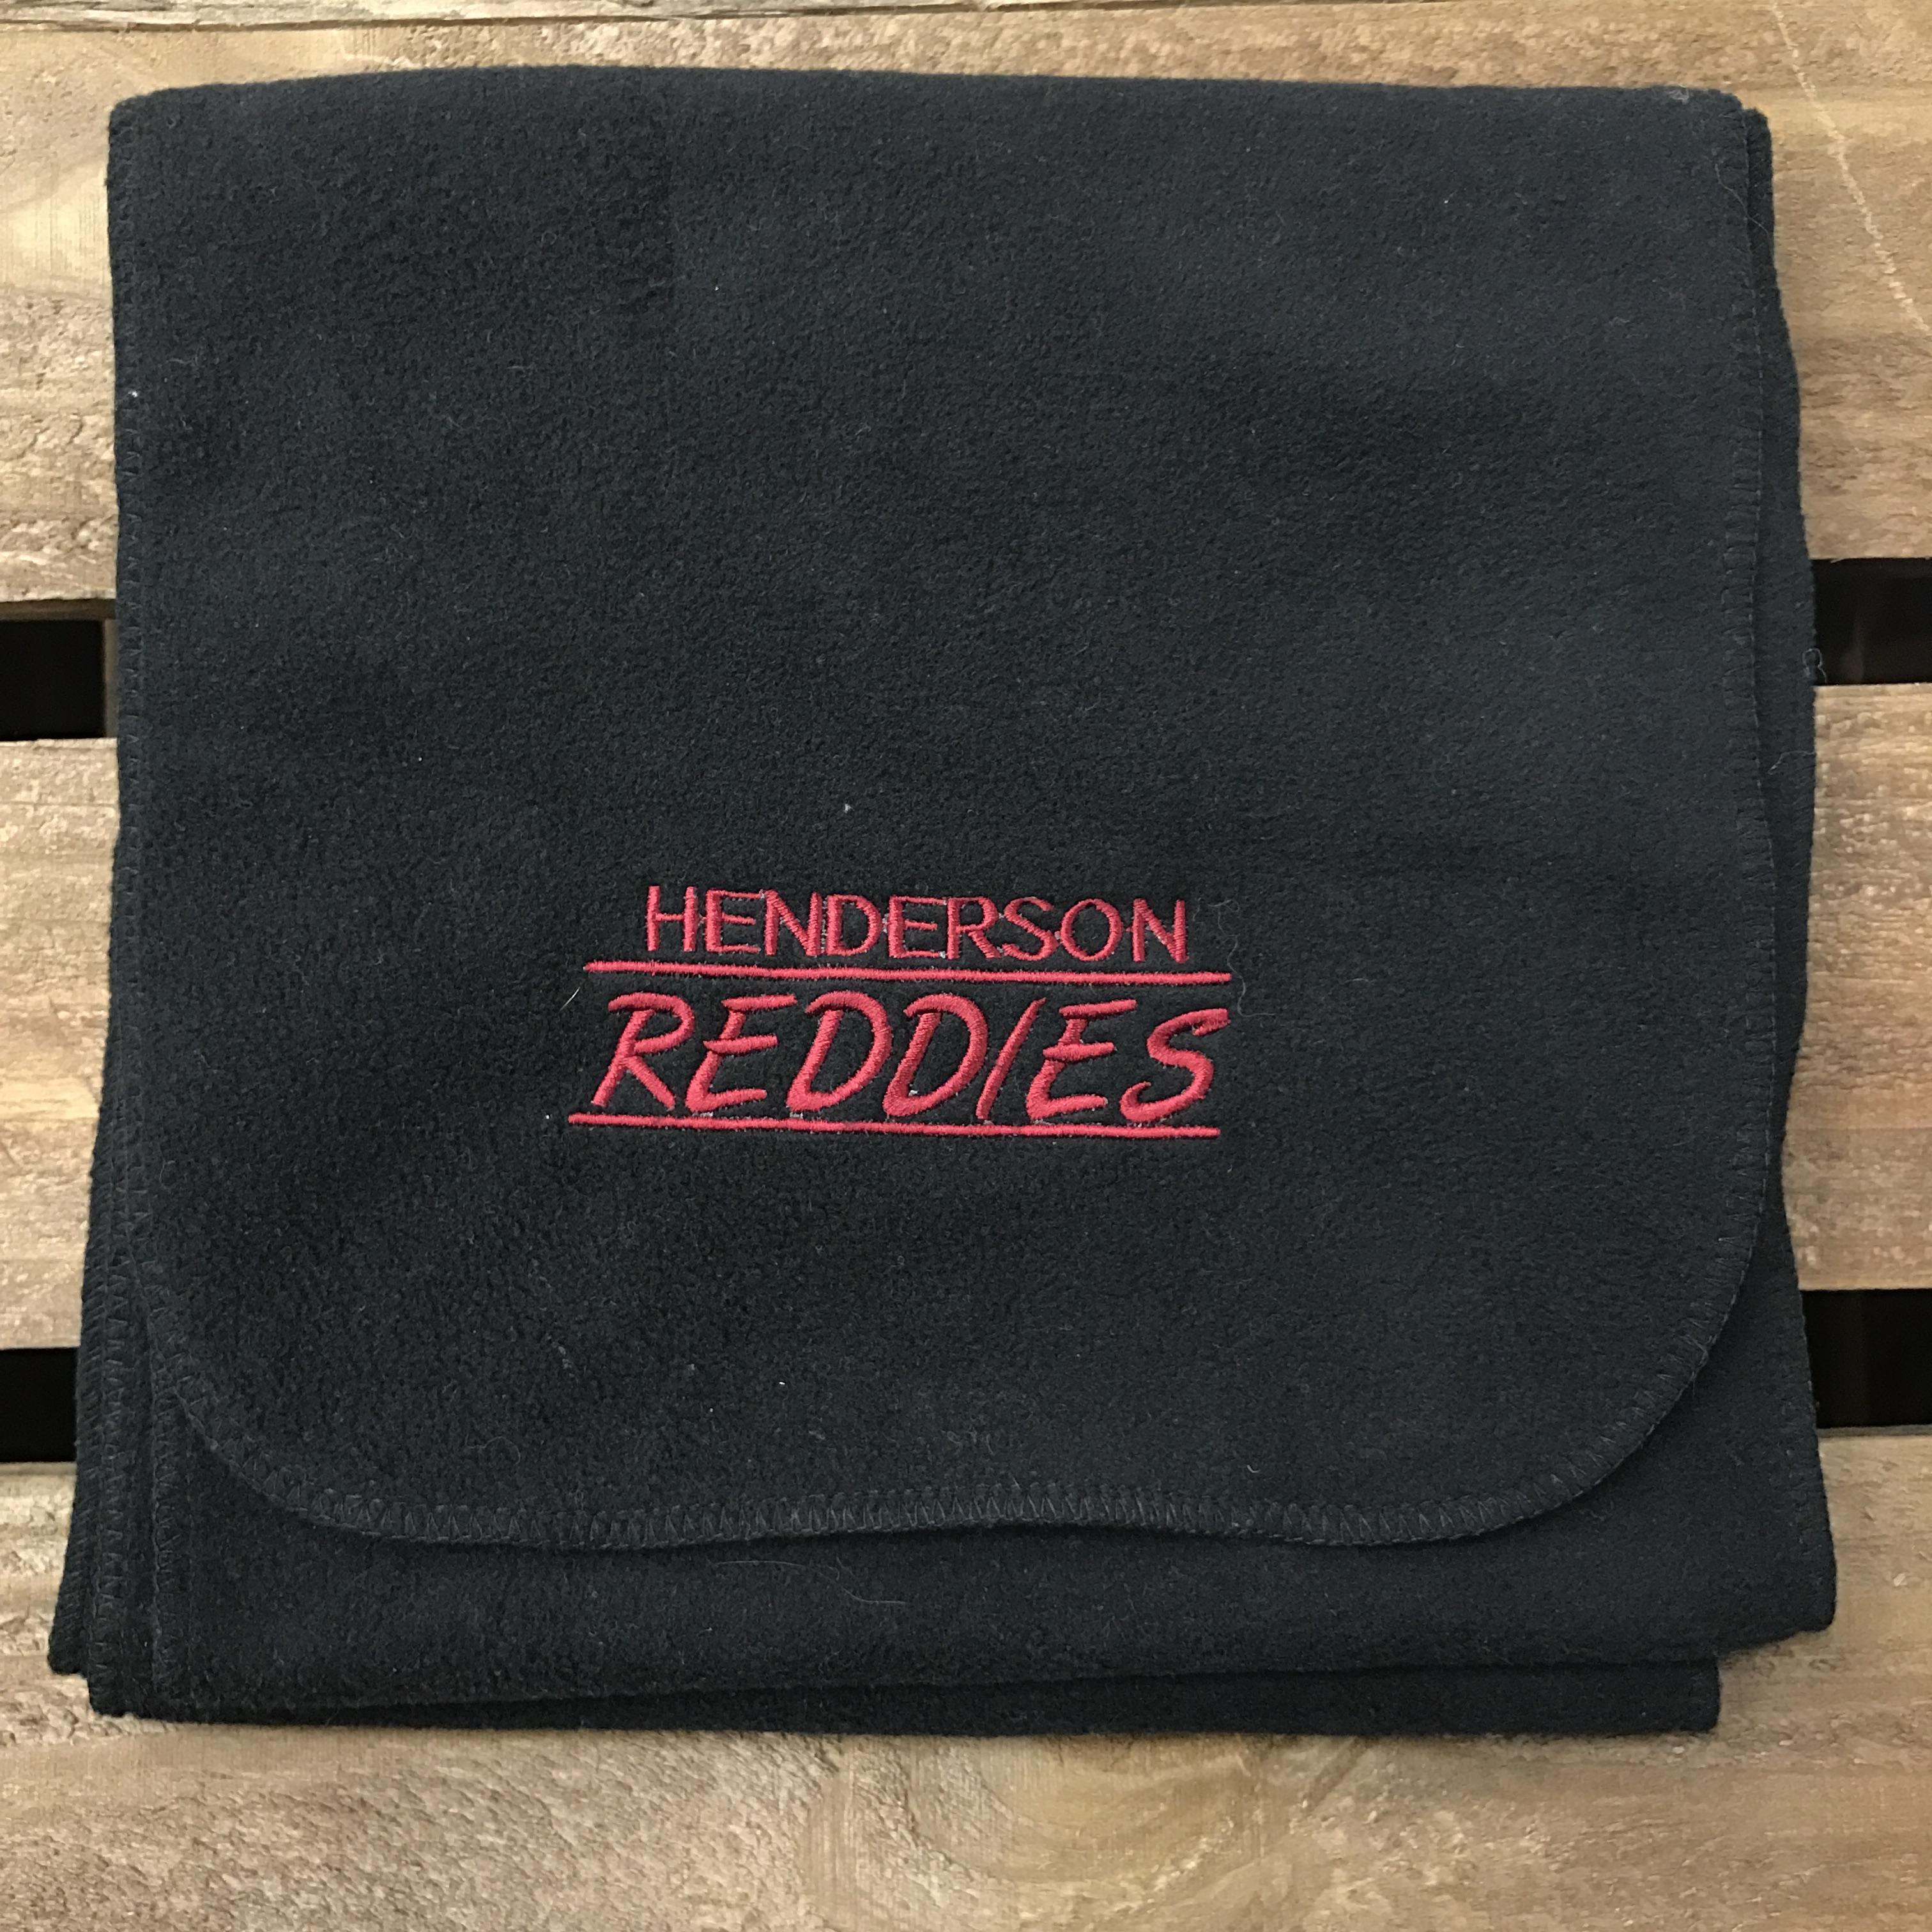 Henderson Reddies Scarf